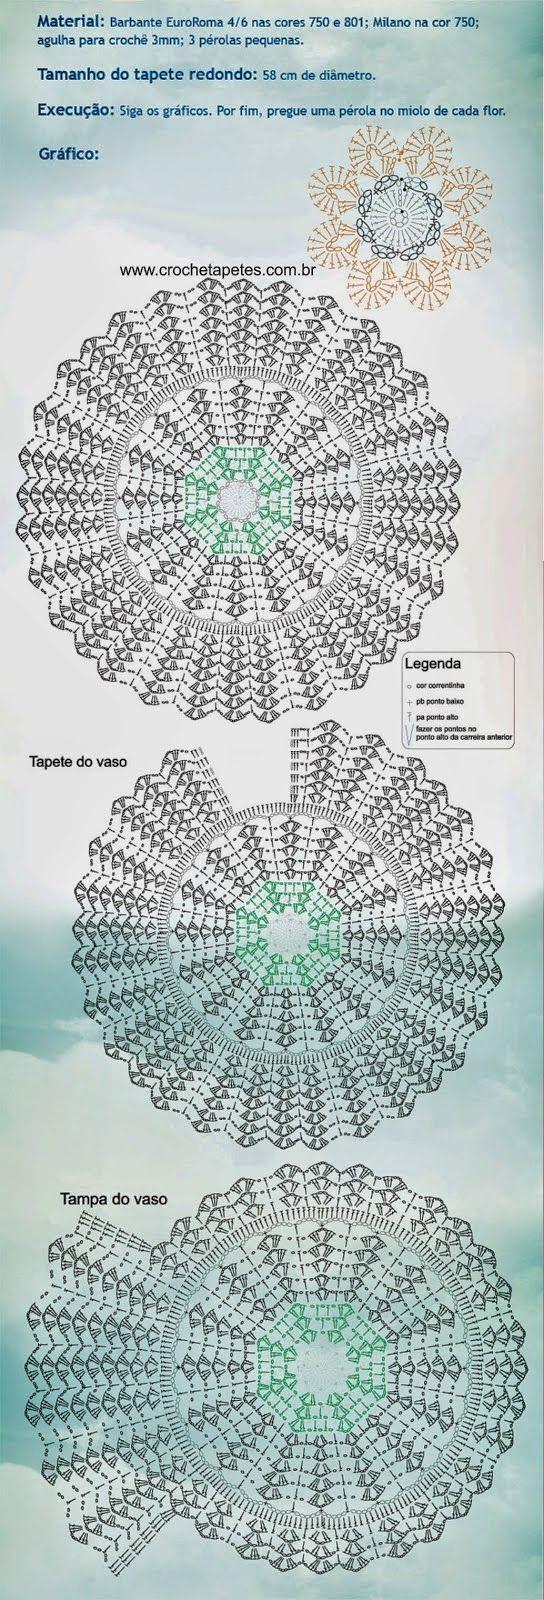 Circle crochet pattern